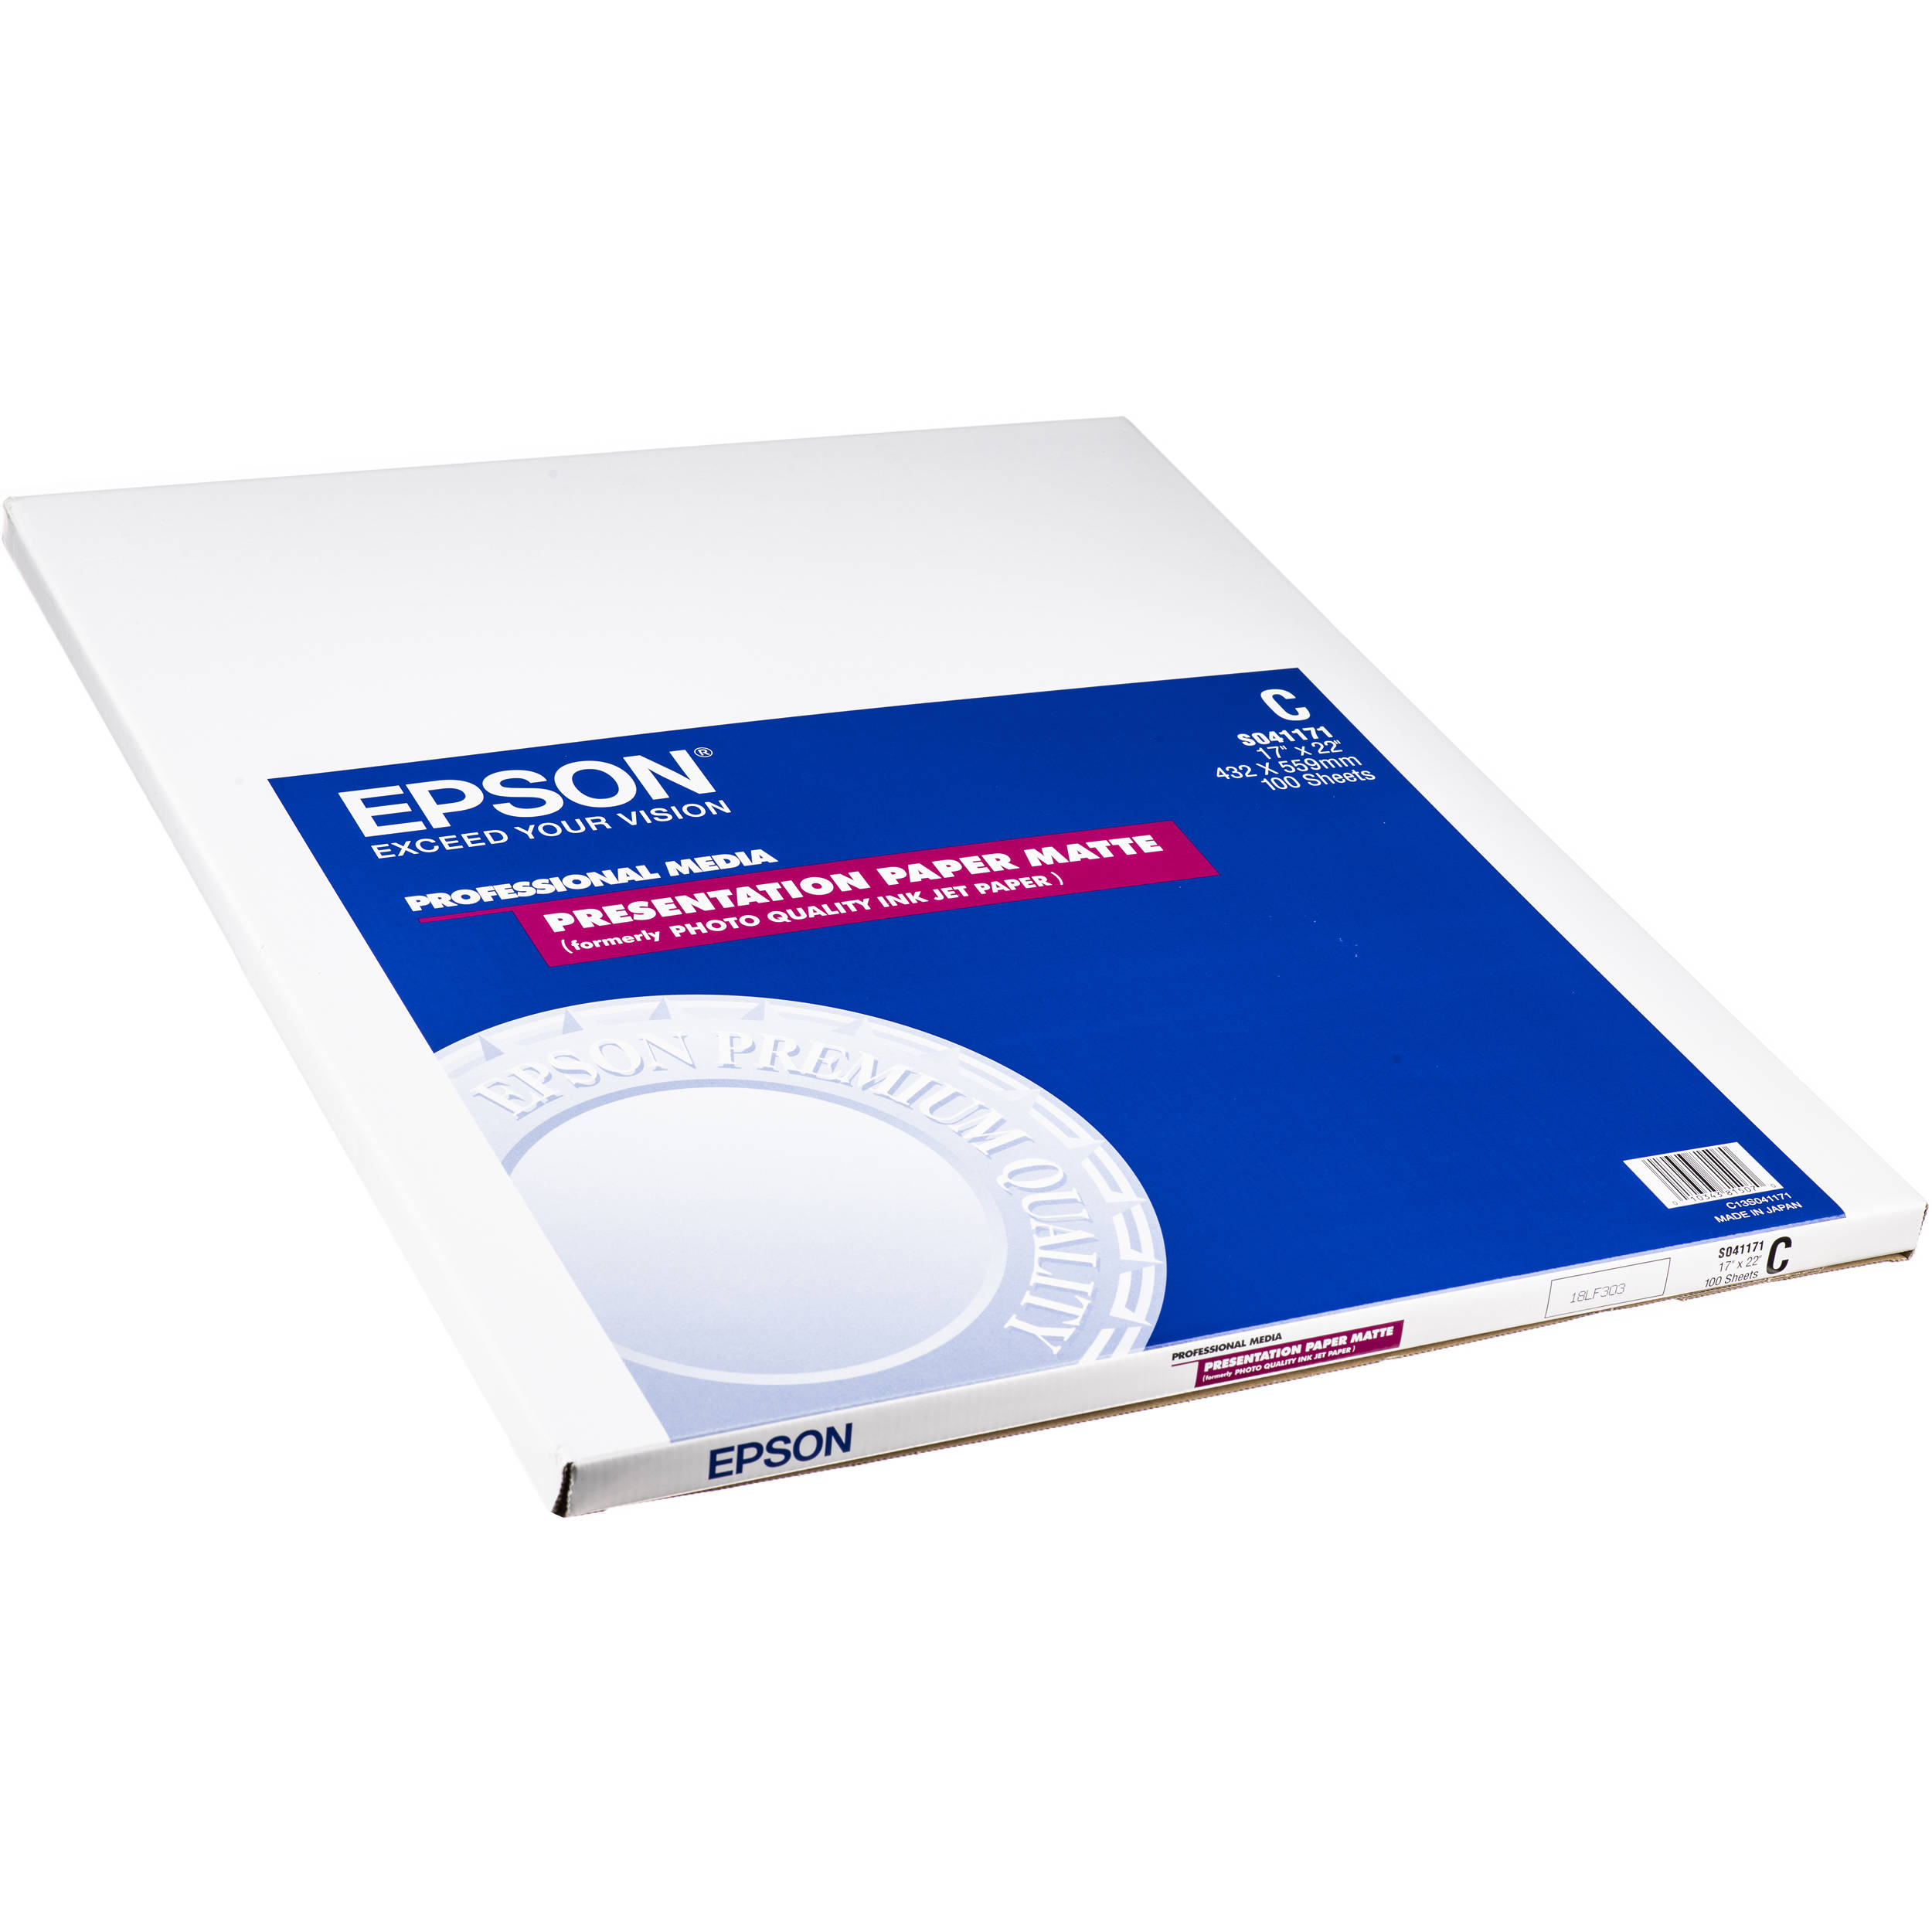 Epson Presentation Paper Matte (8 5 x 11